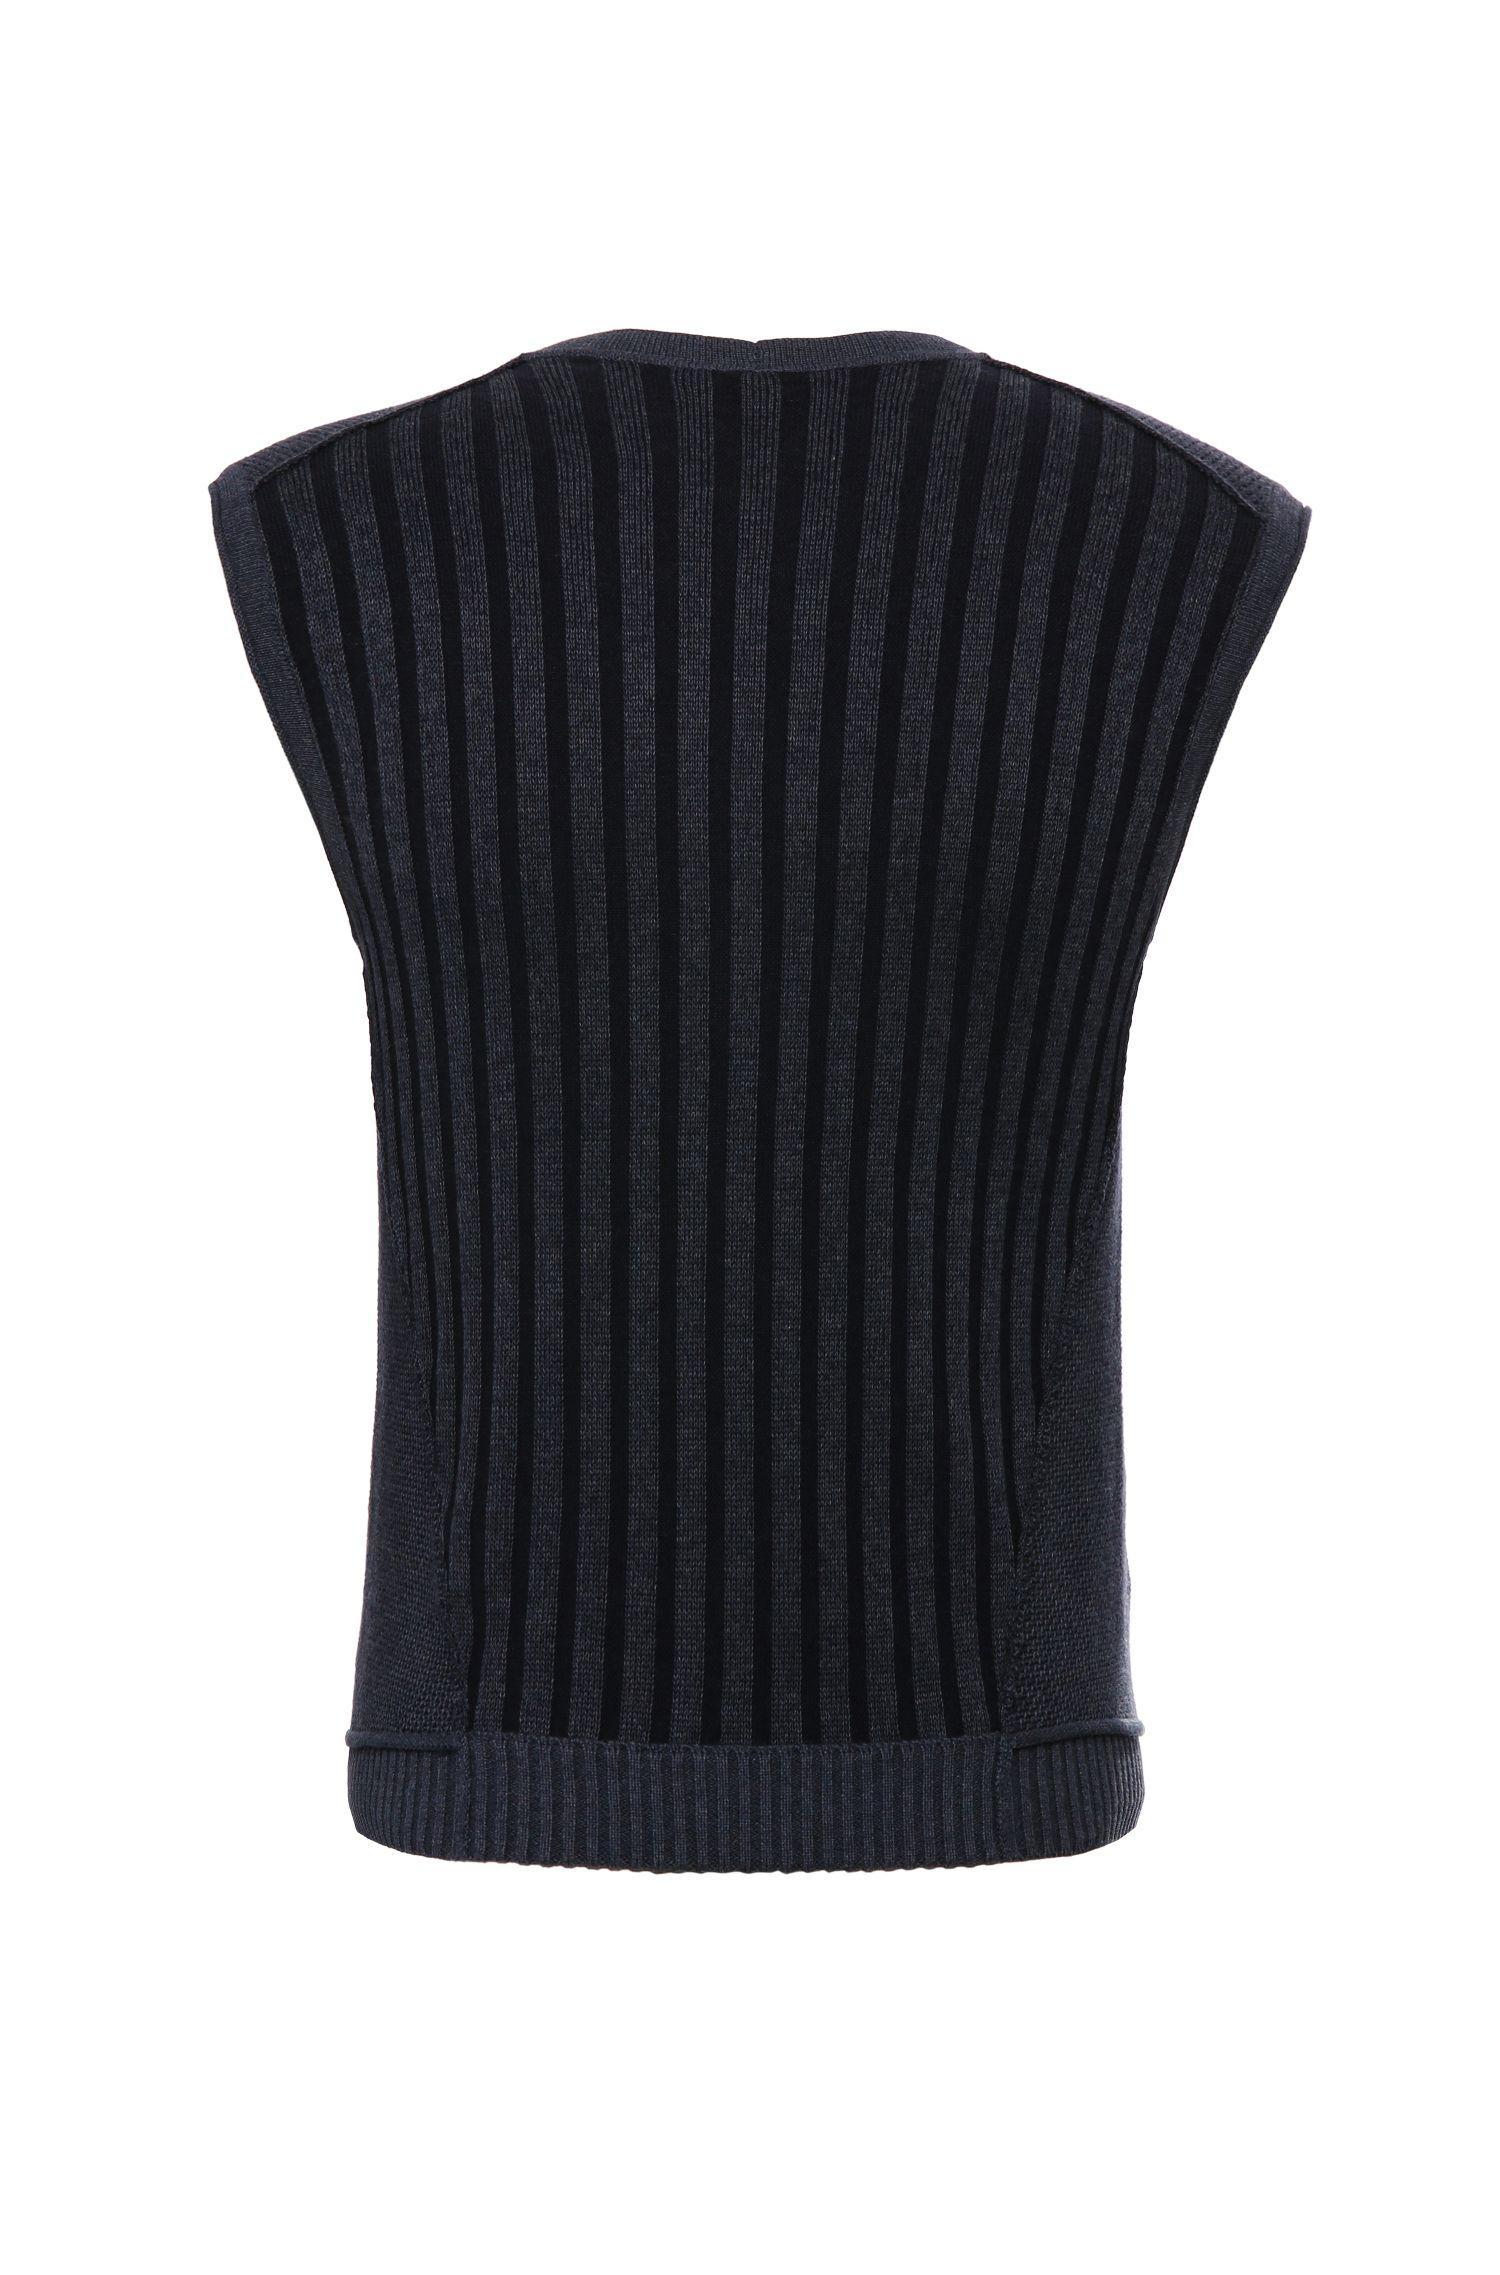 Gestrickte Slim-Fit Weste aus Baumwolle: ´Kralito`